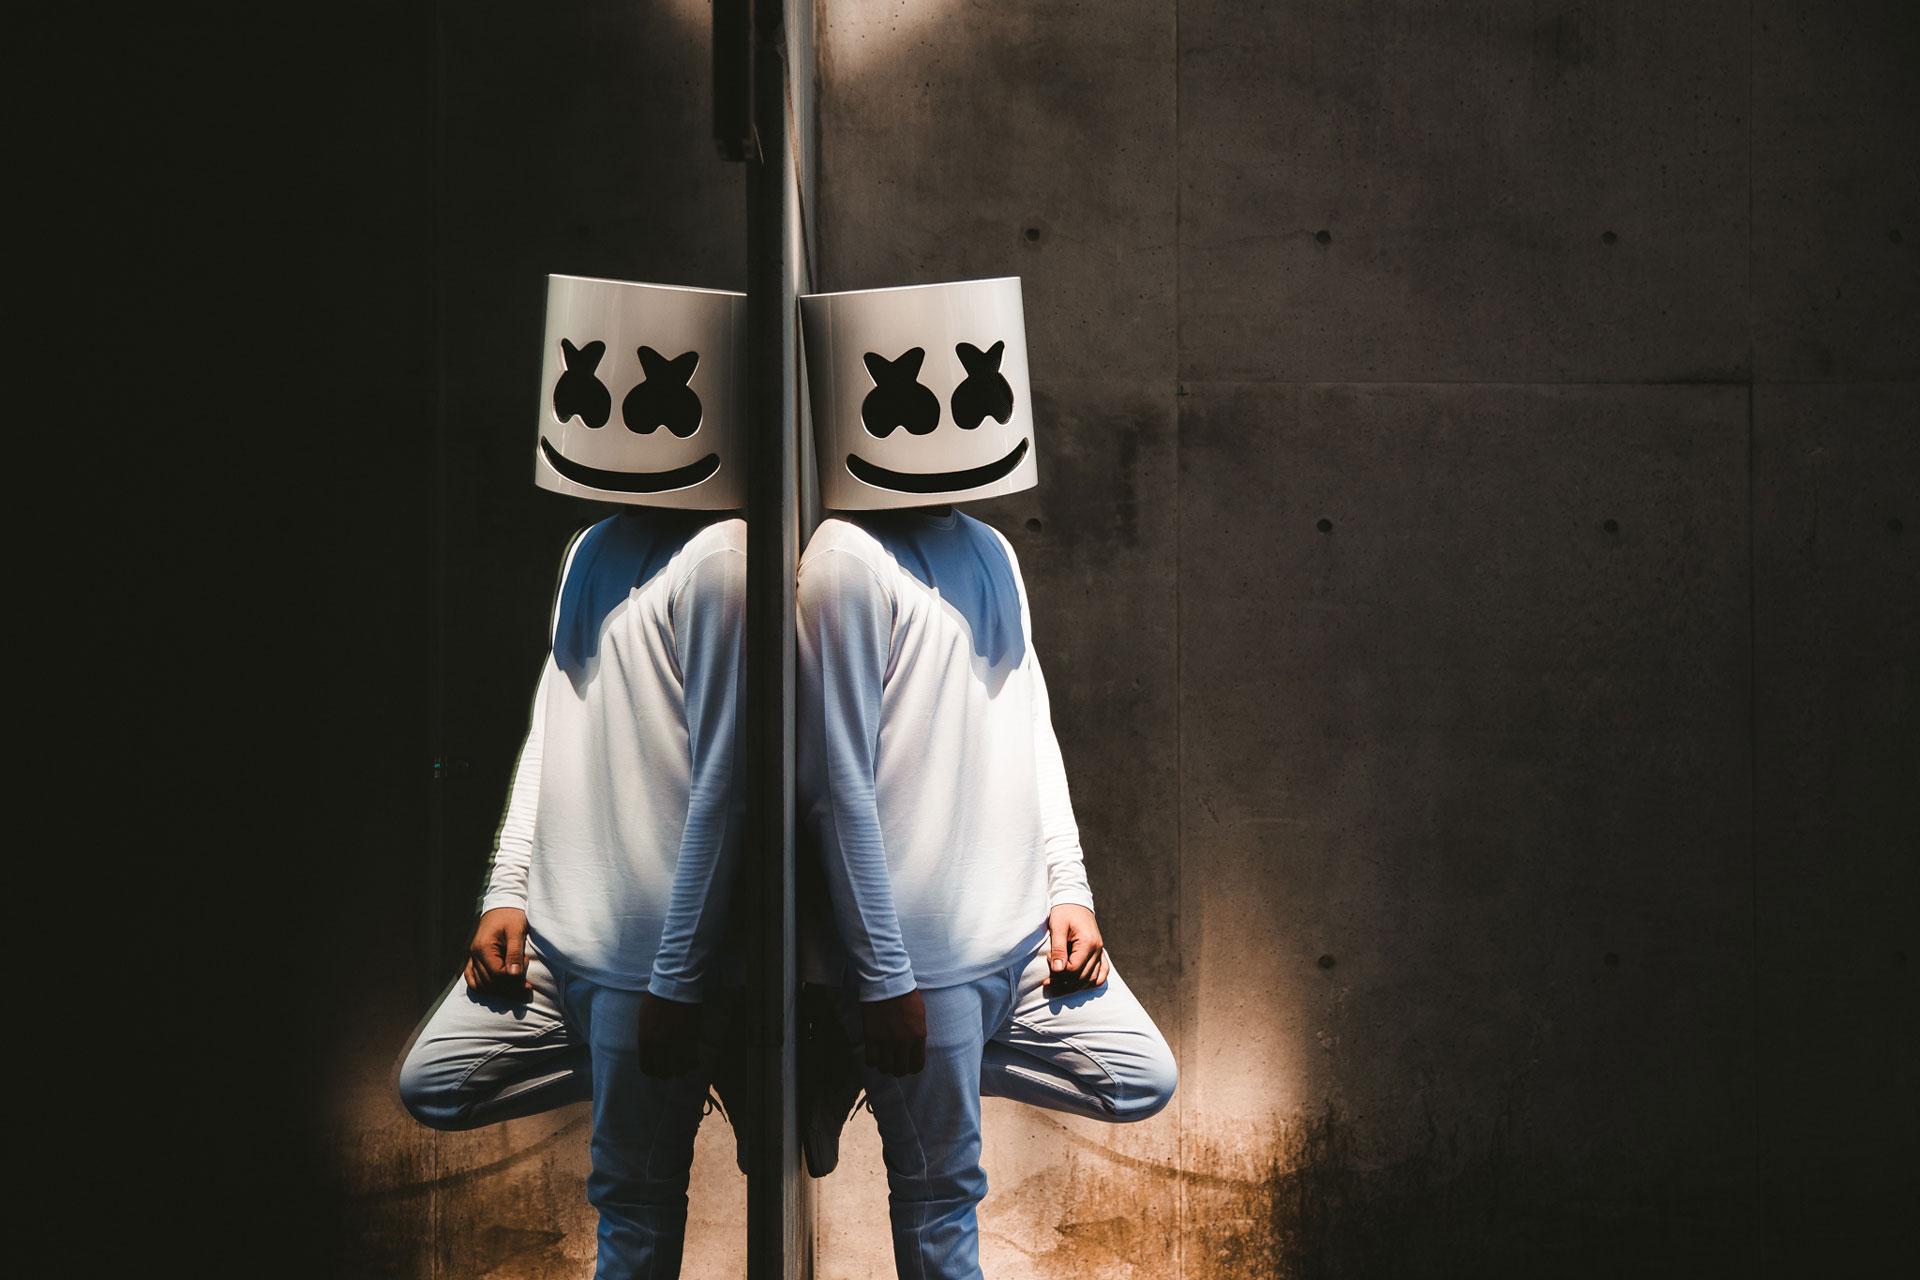 Marshmello DJ 2016 1400x1050 Resolution